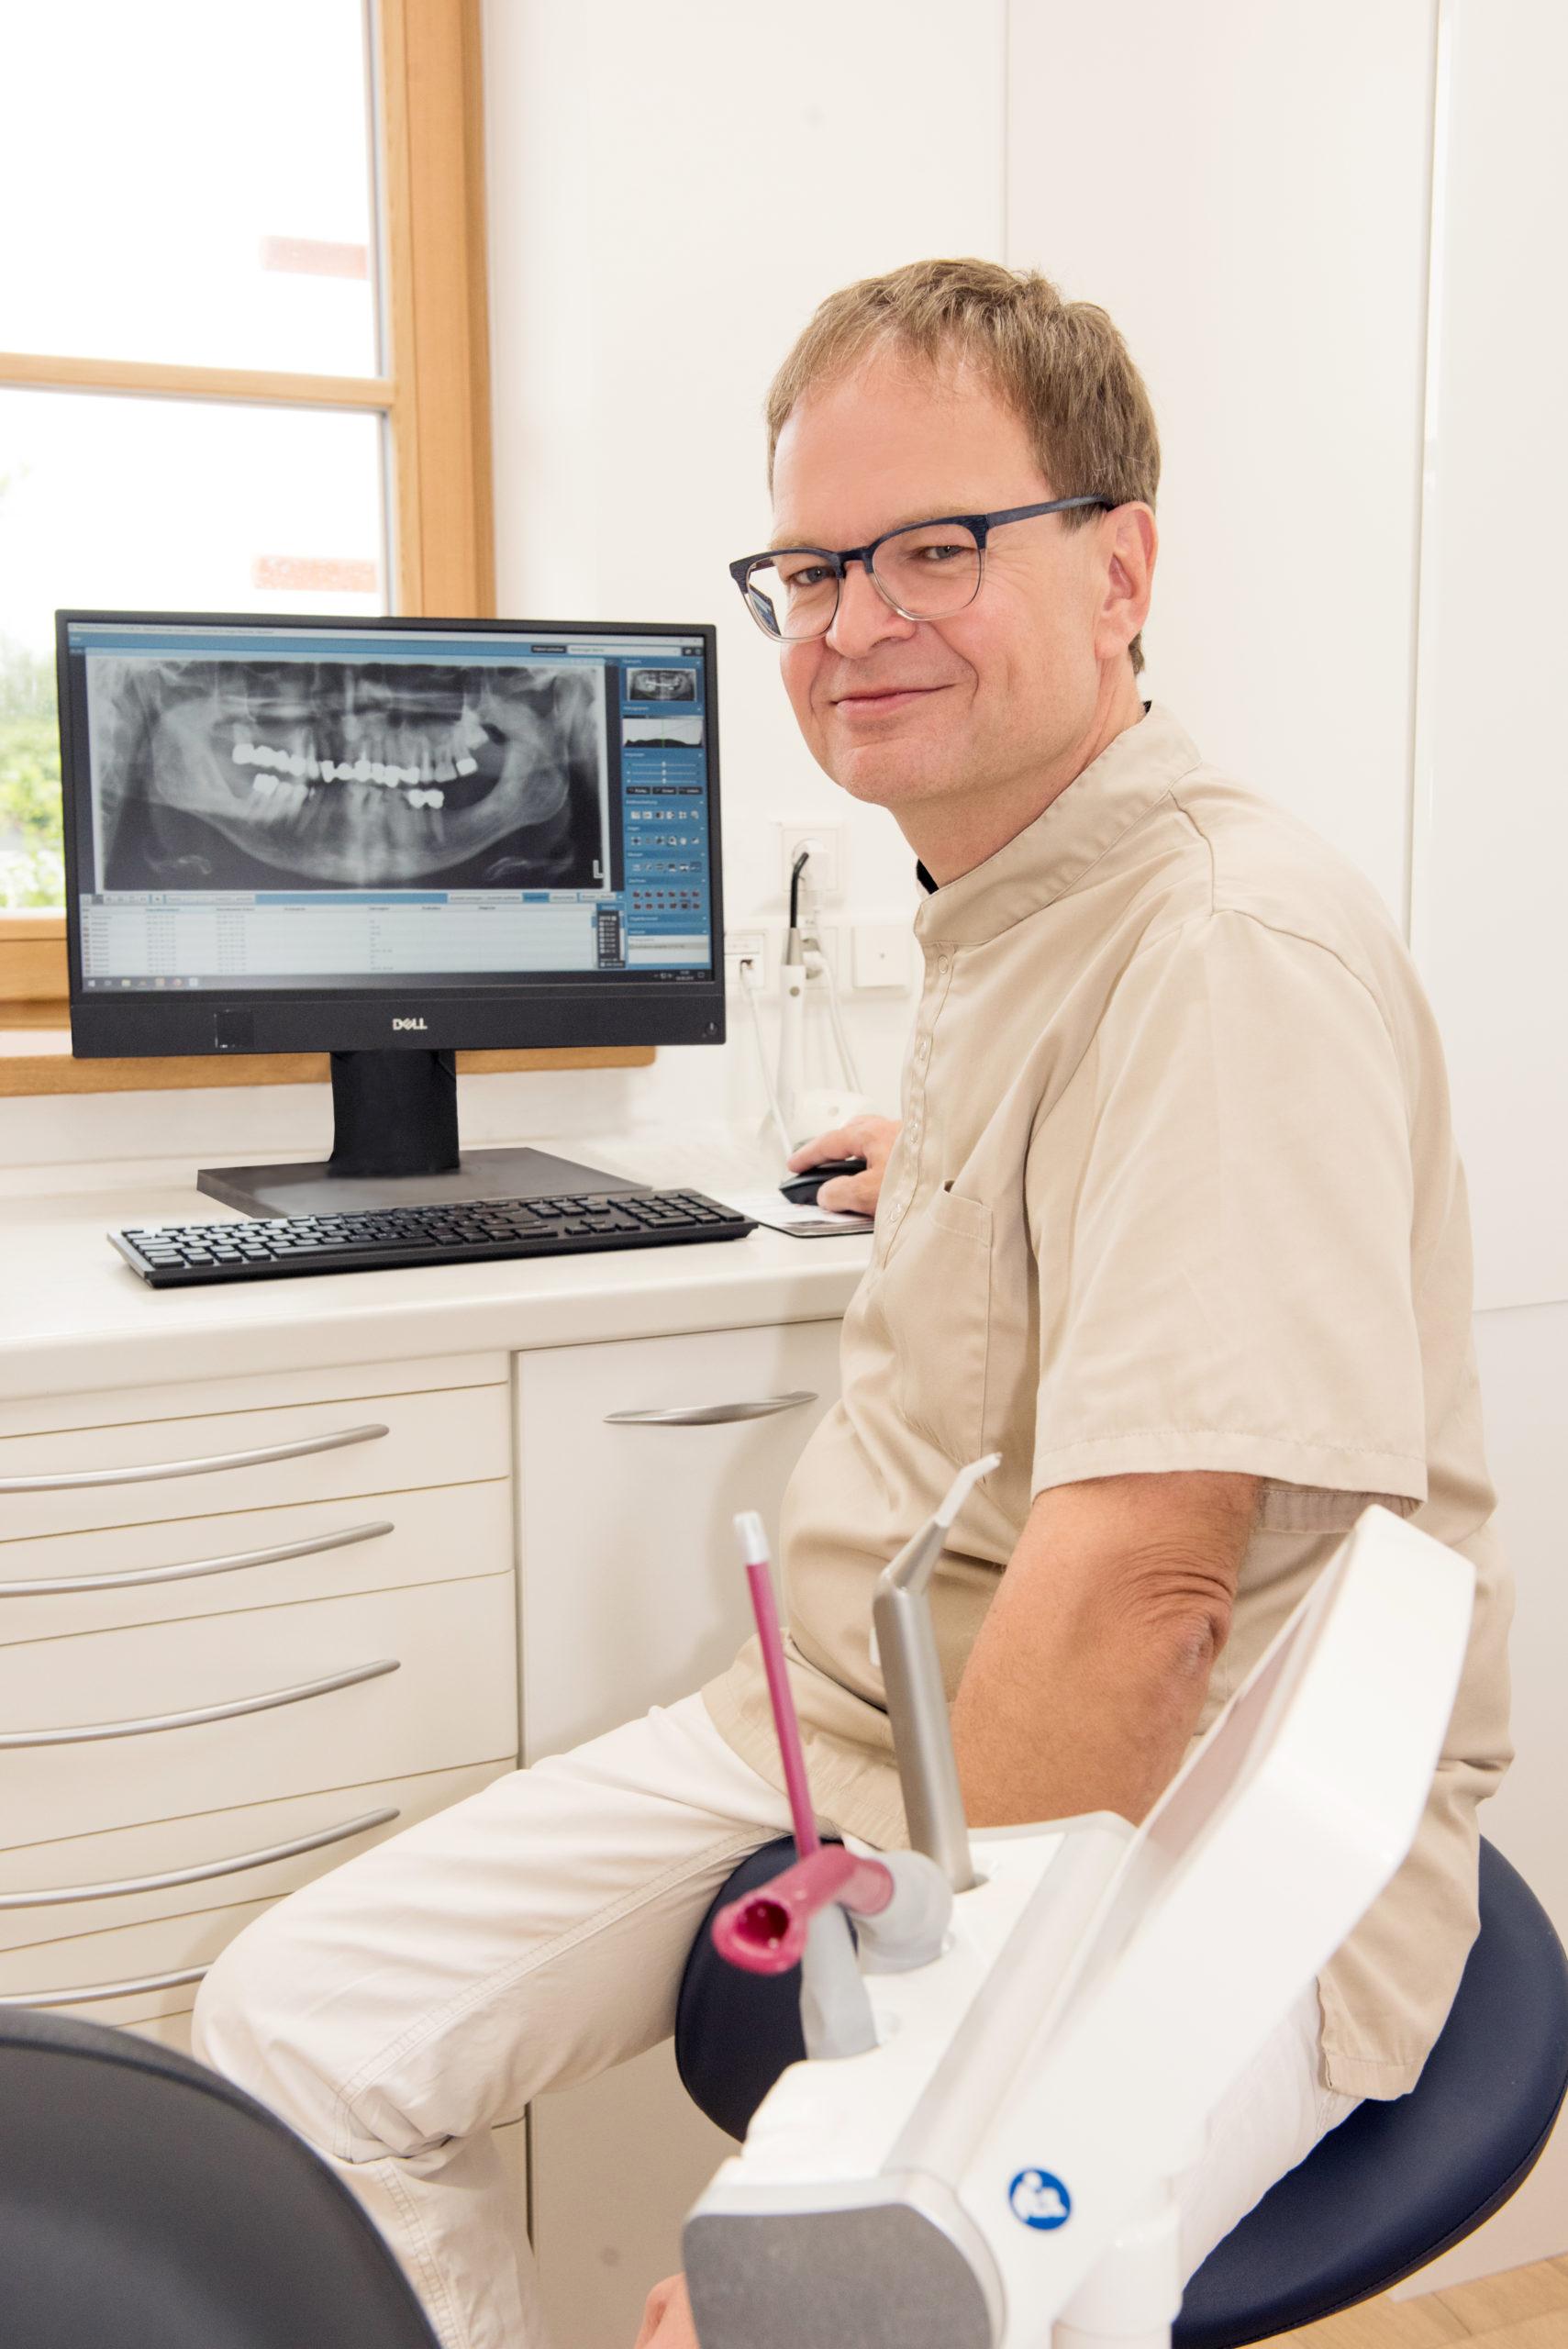 Dr. Jürgen Rauscher